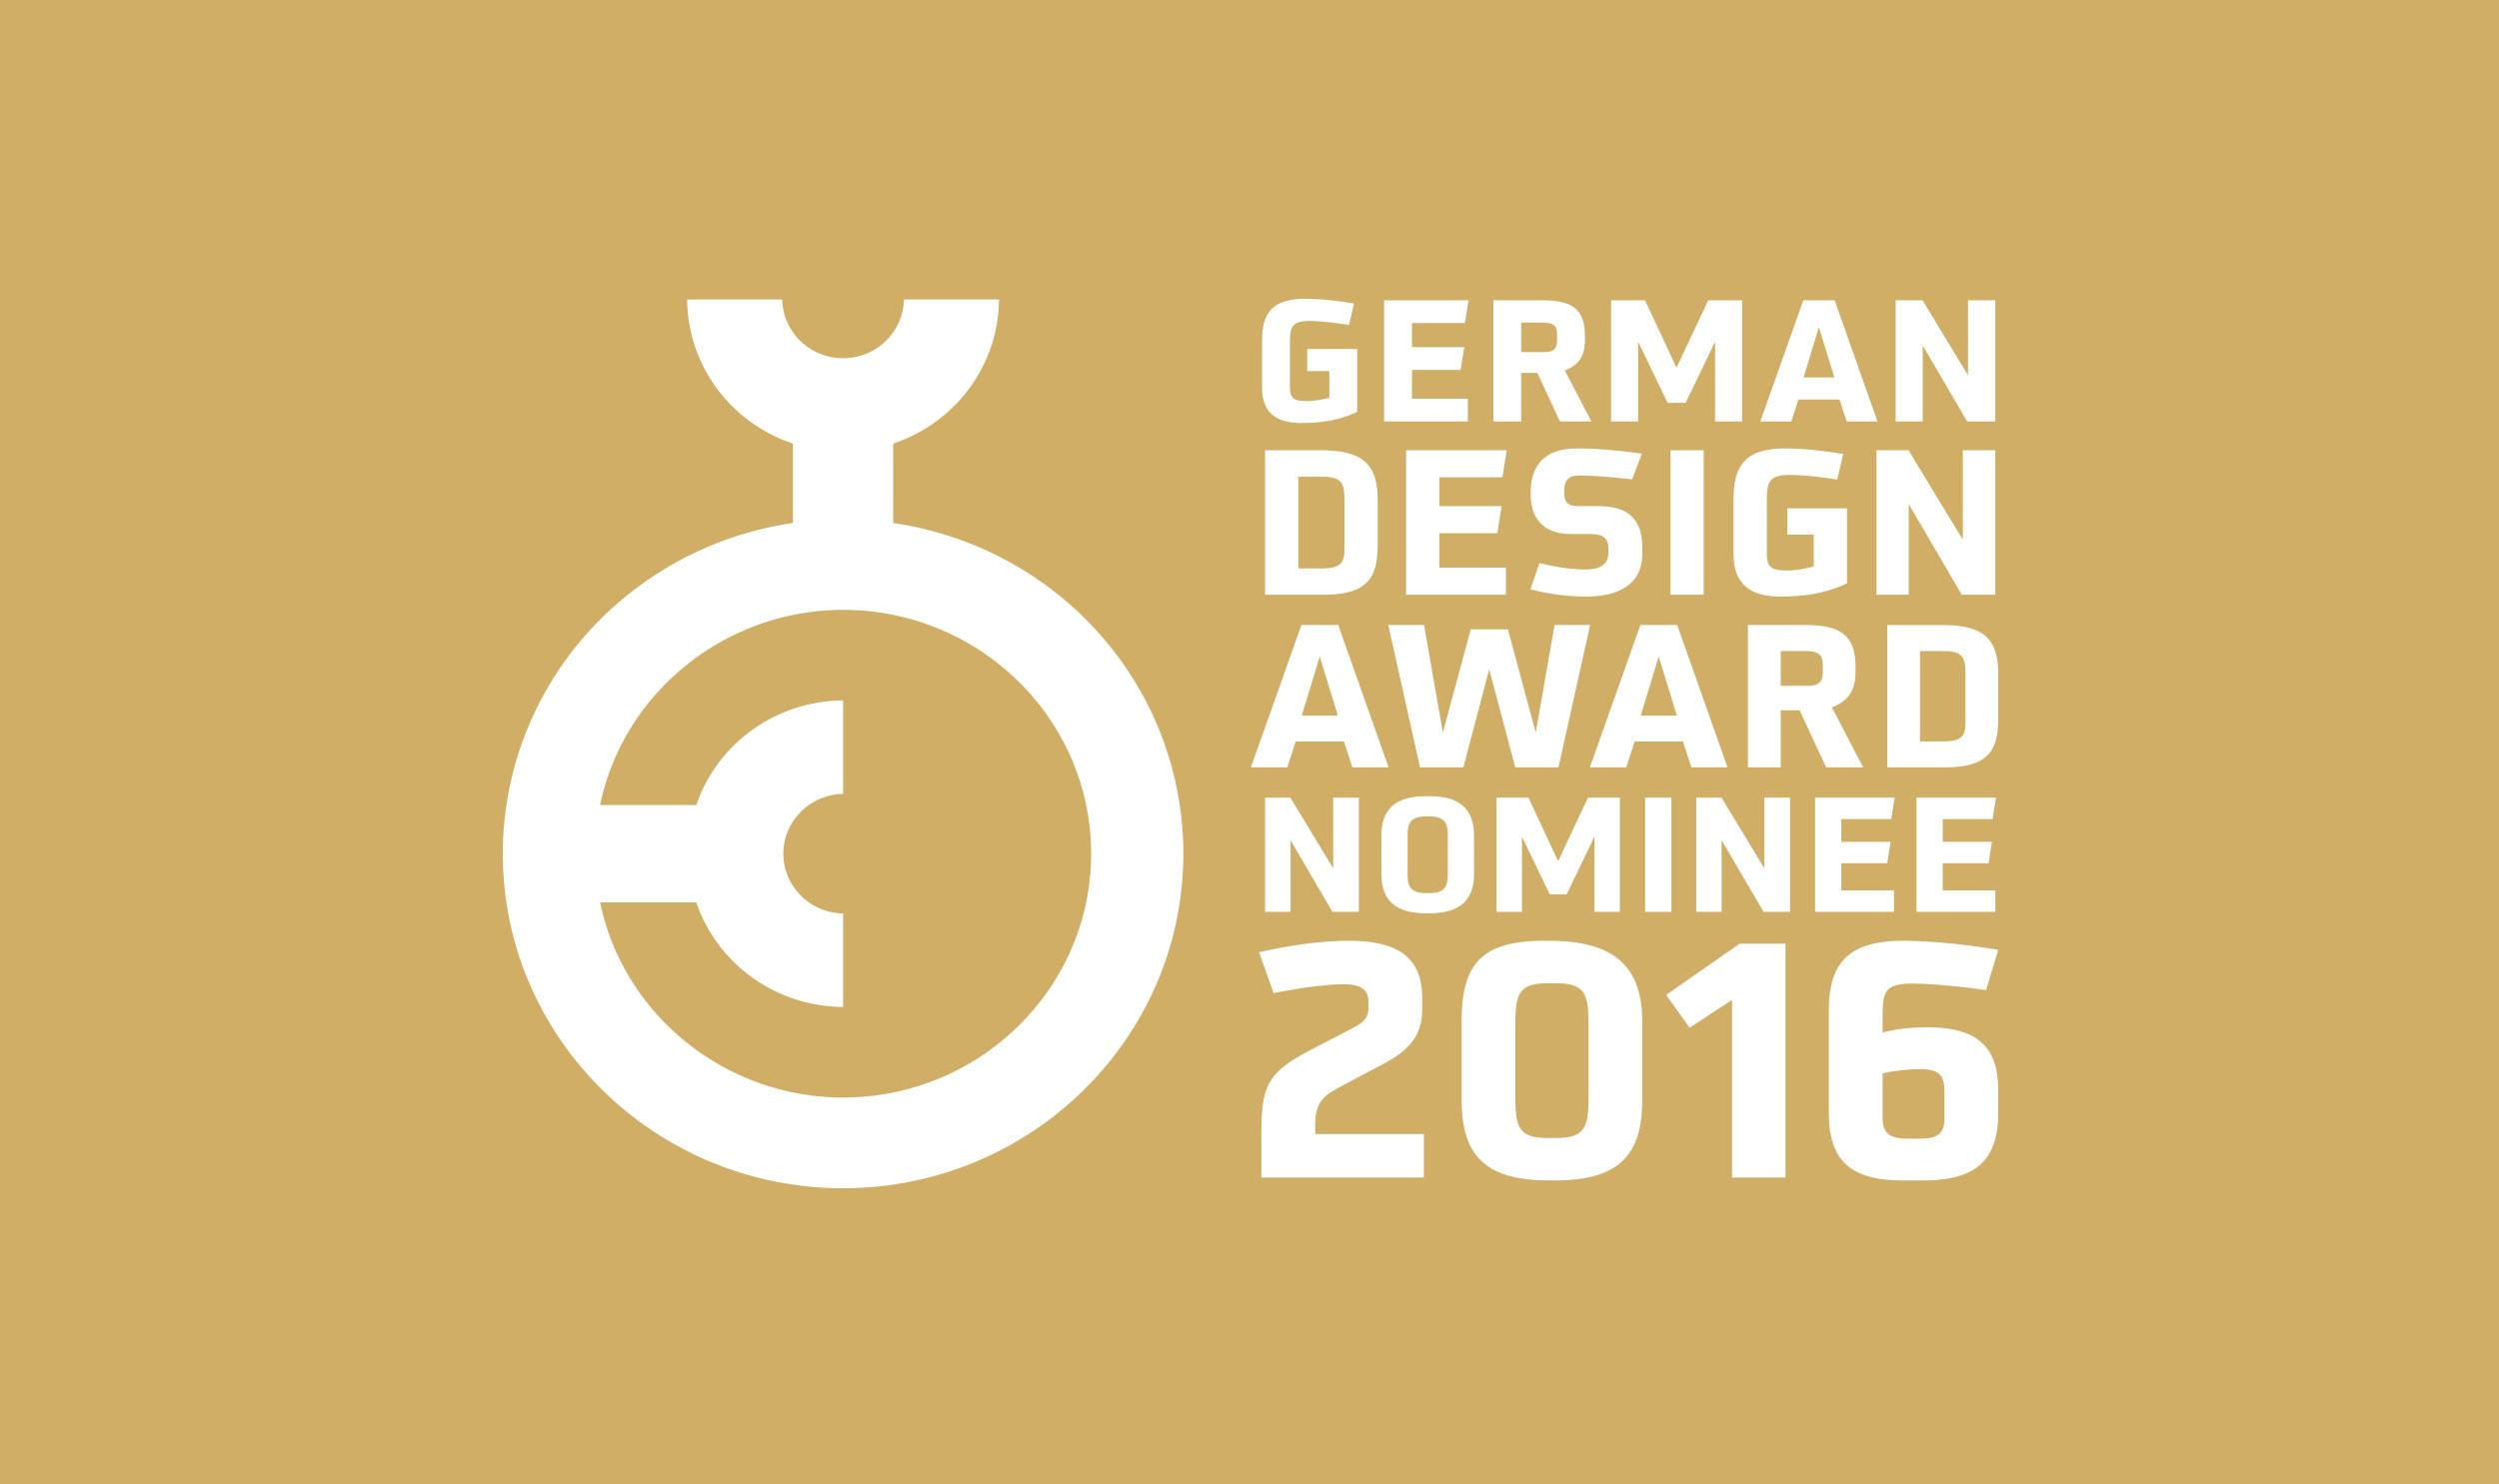 AWARD_German-Design-Award_2016_Nominee